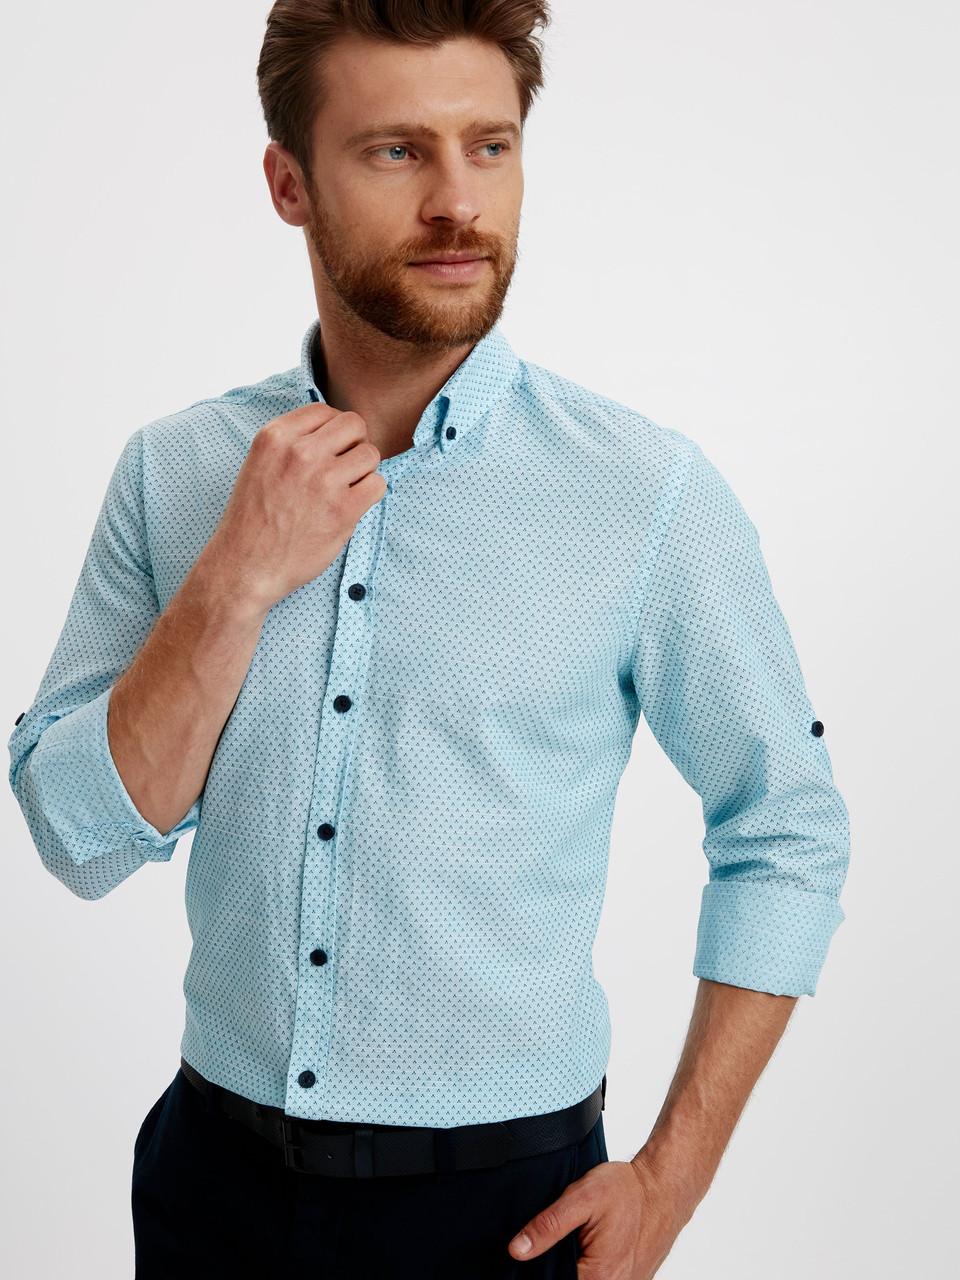 Голубая мужская рубашка Lc Waikiki / ЛС Вайкики в мелкие синие точки